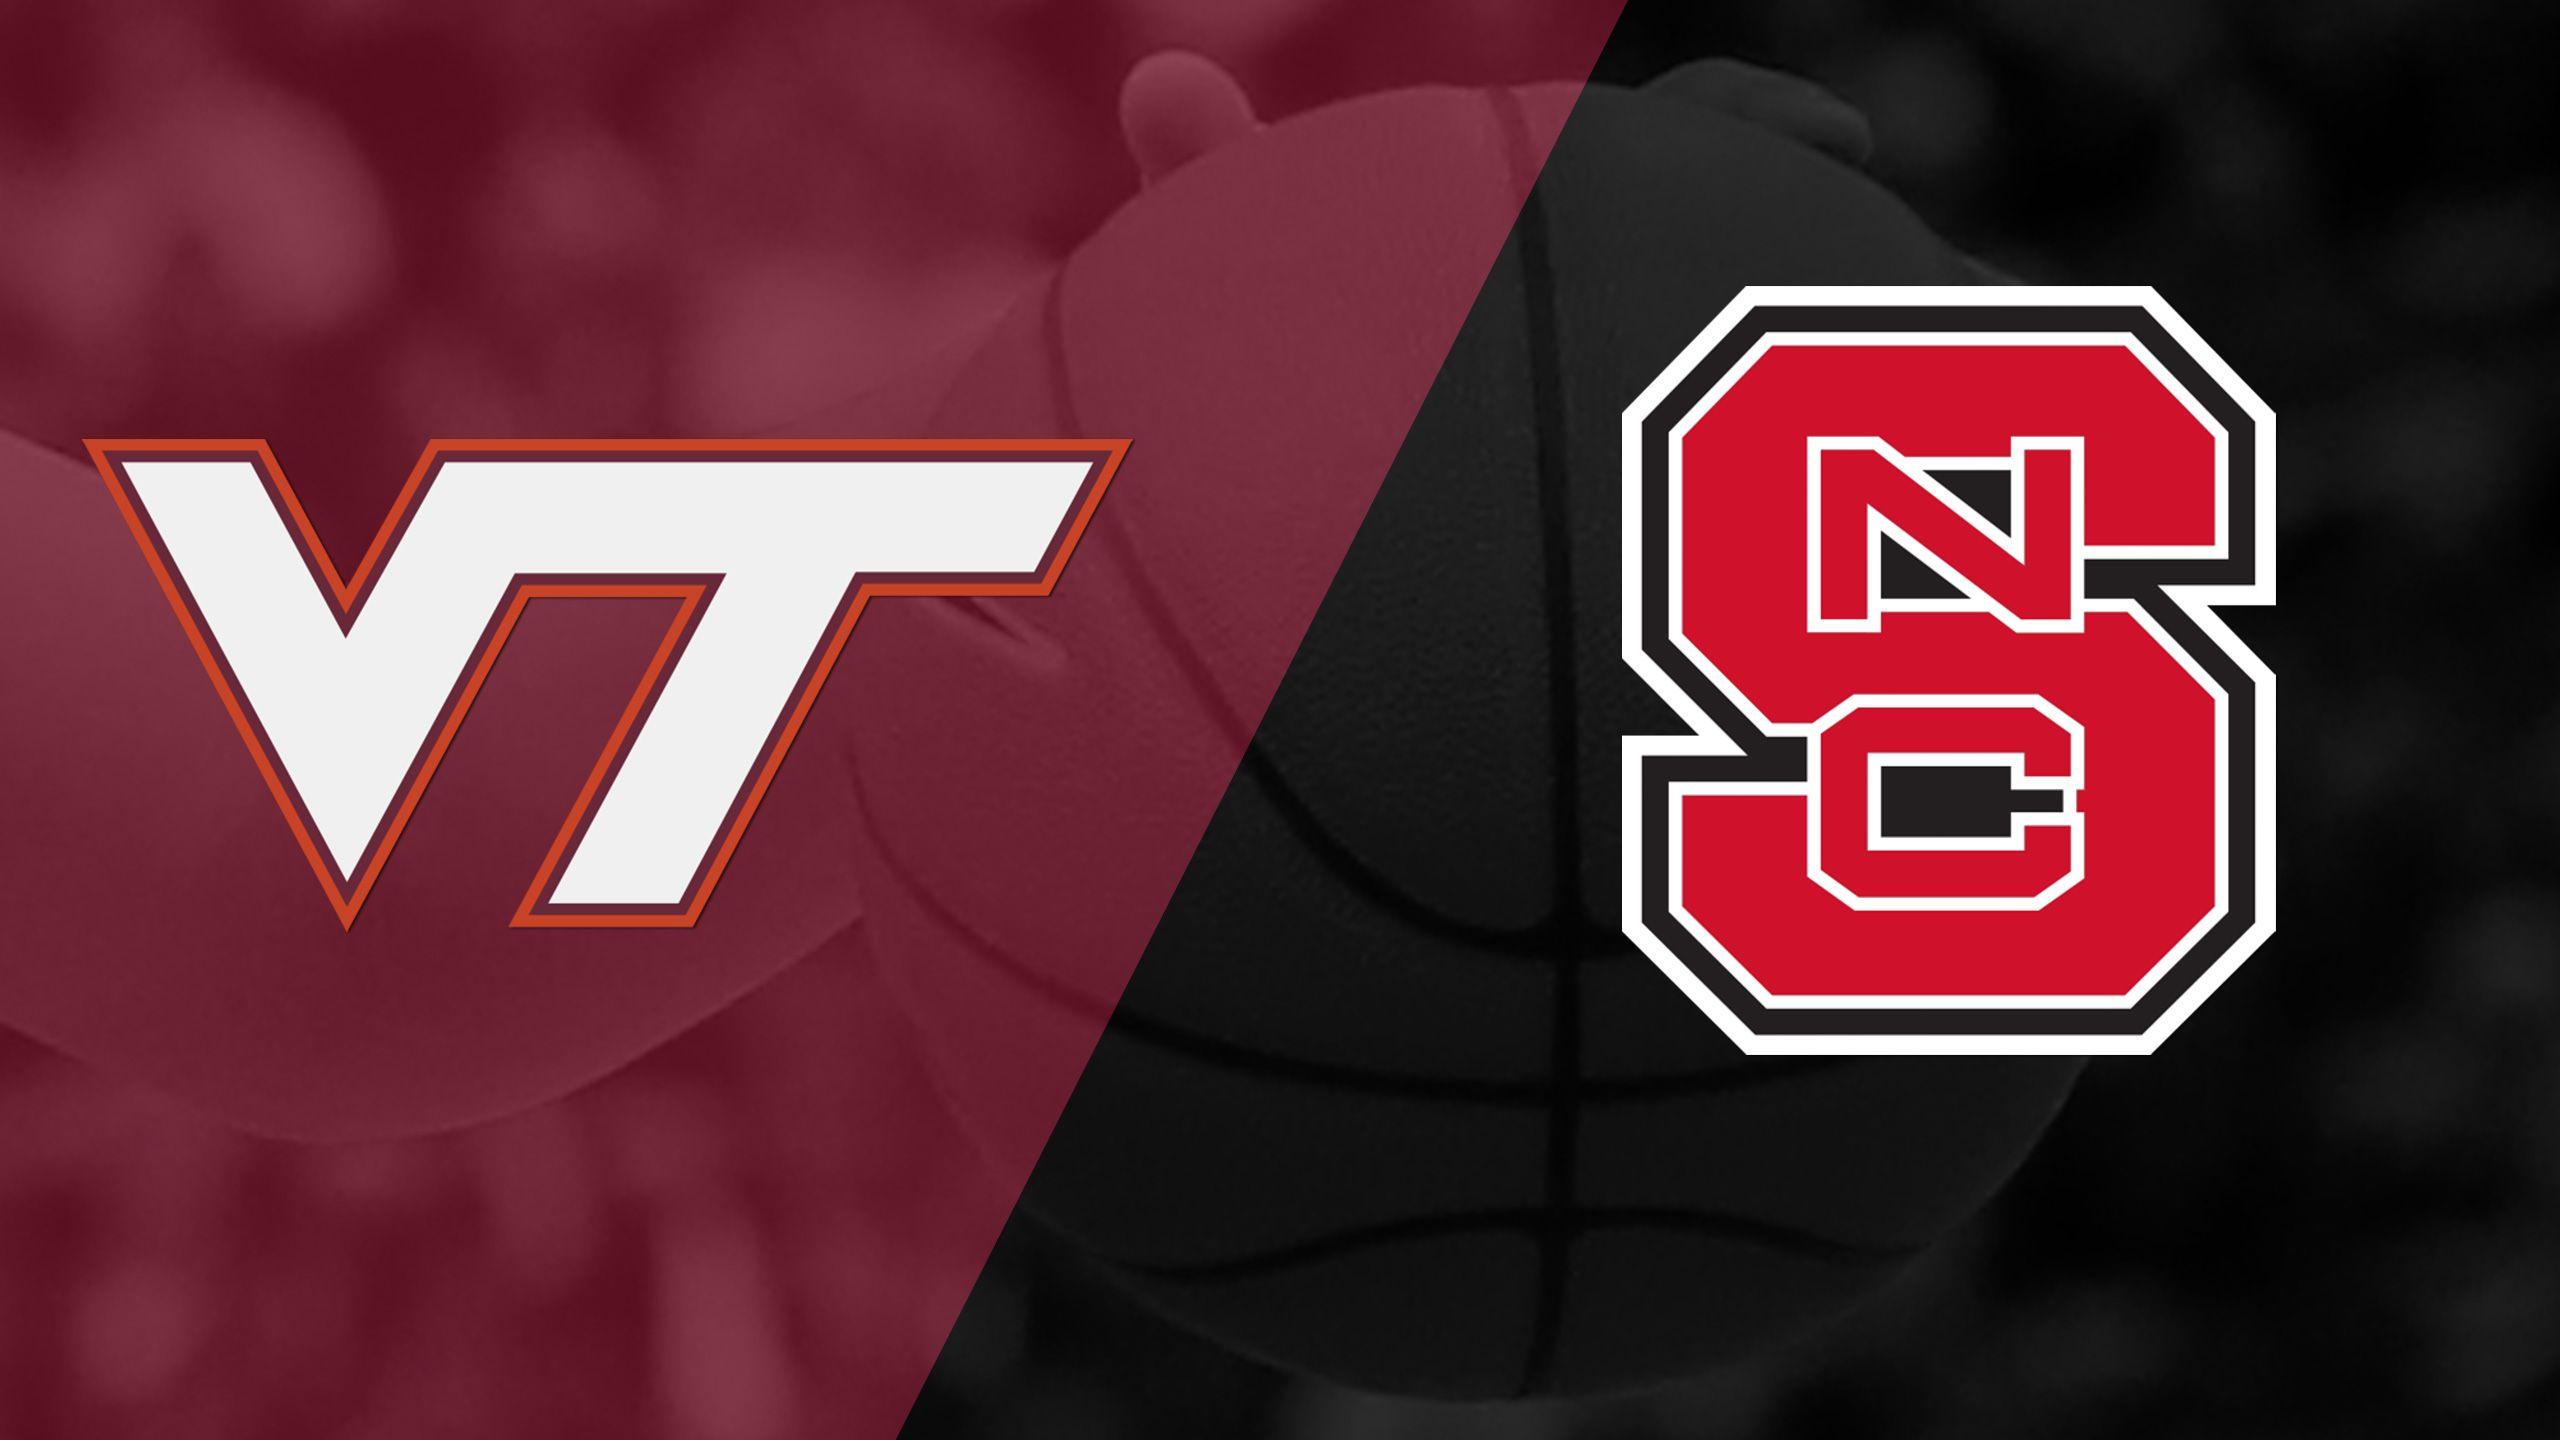 Virginia Tech vs. #17 NC State (W Basketball)